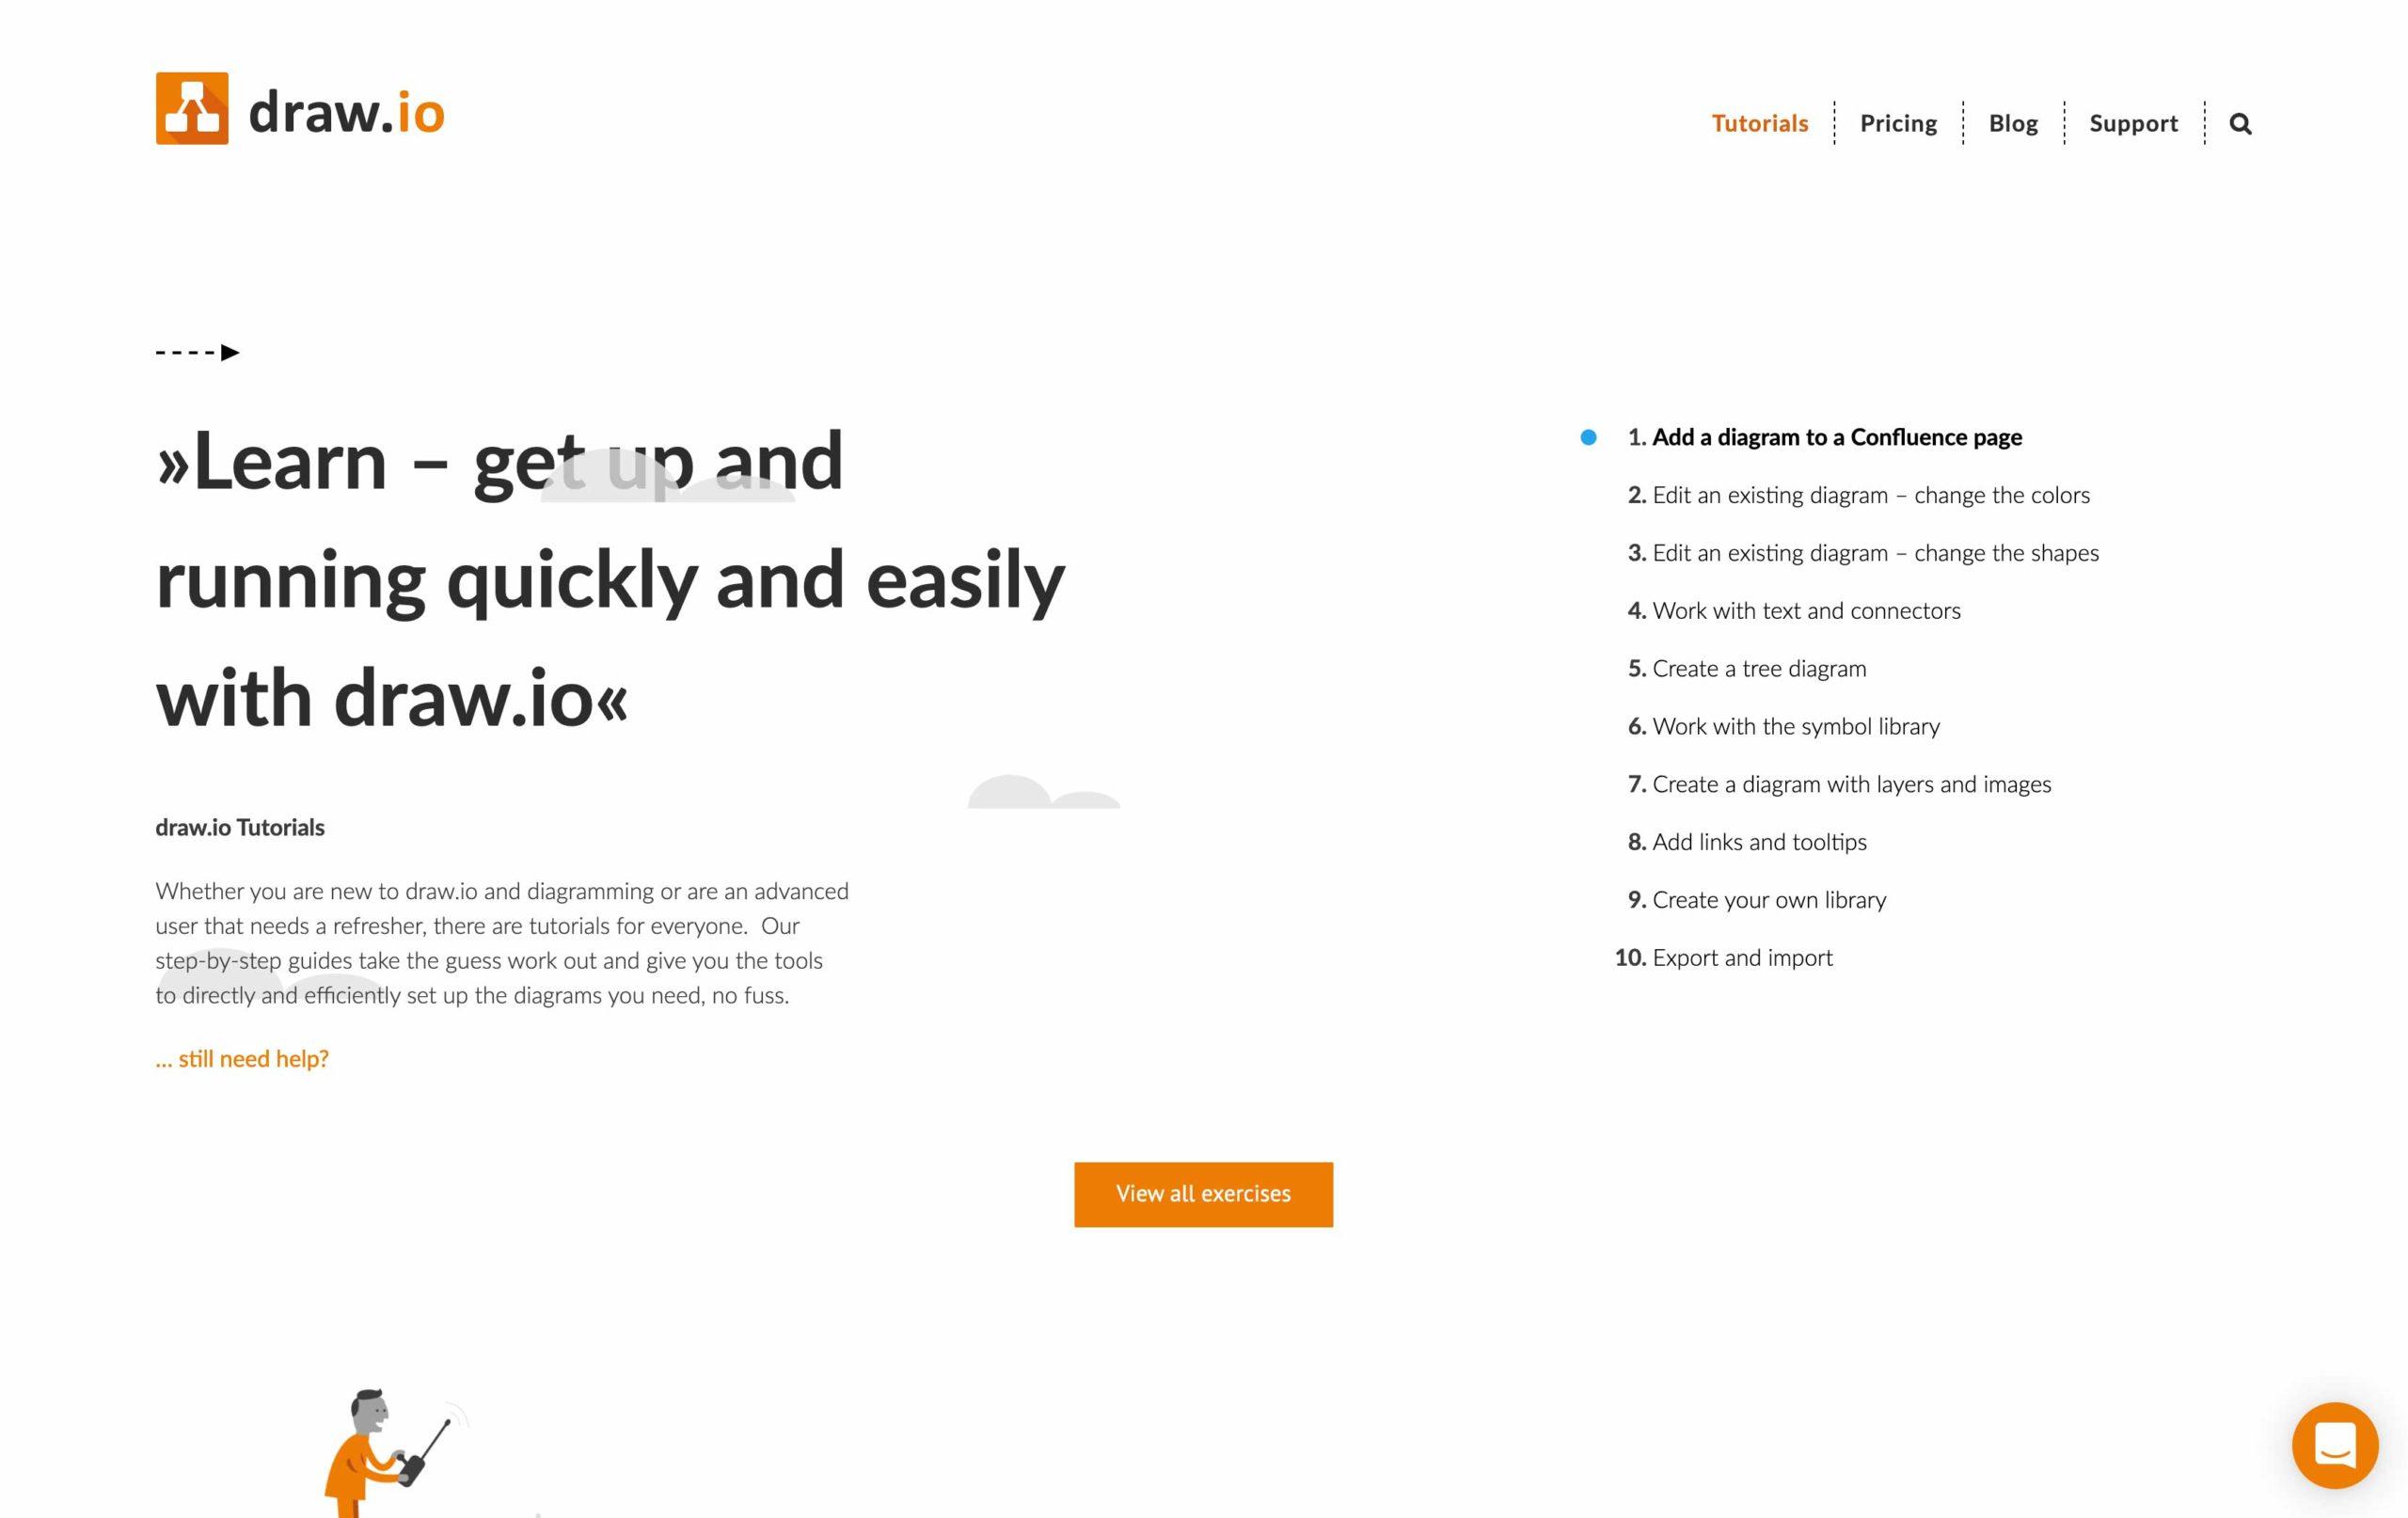 draw.io - Learning